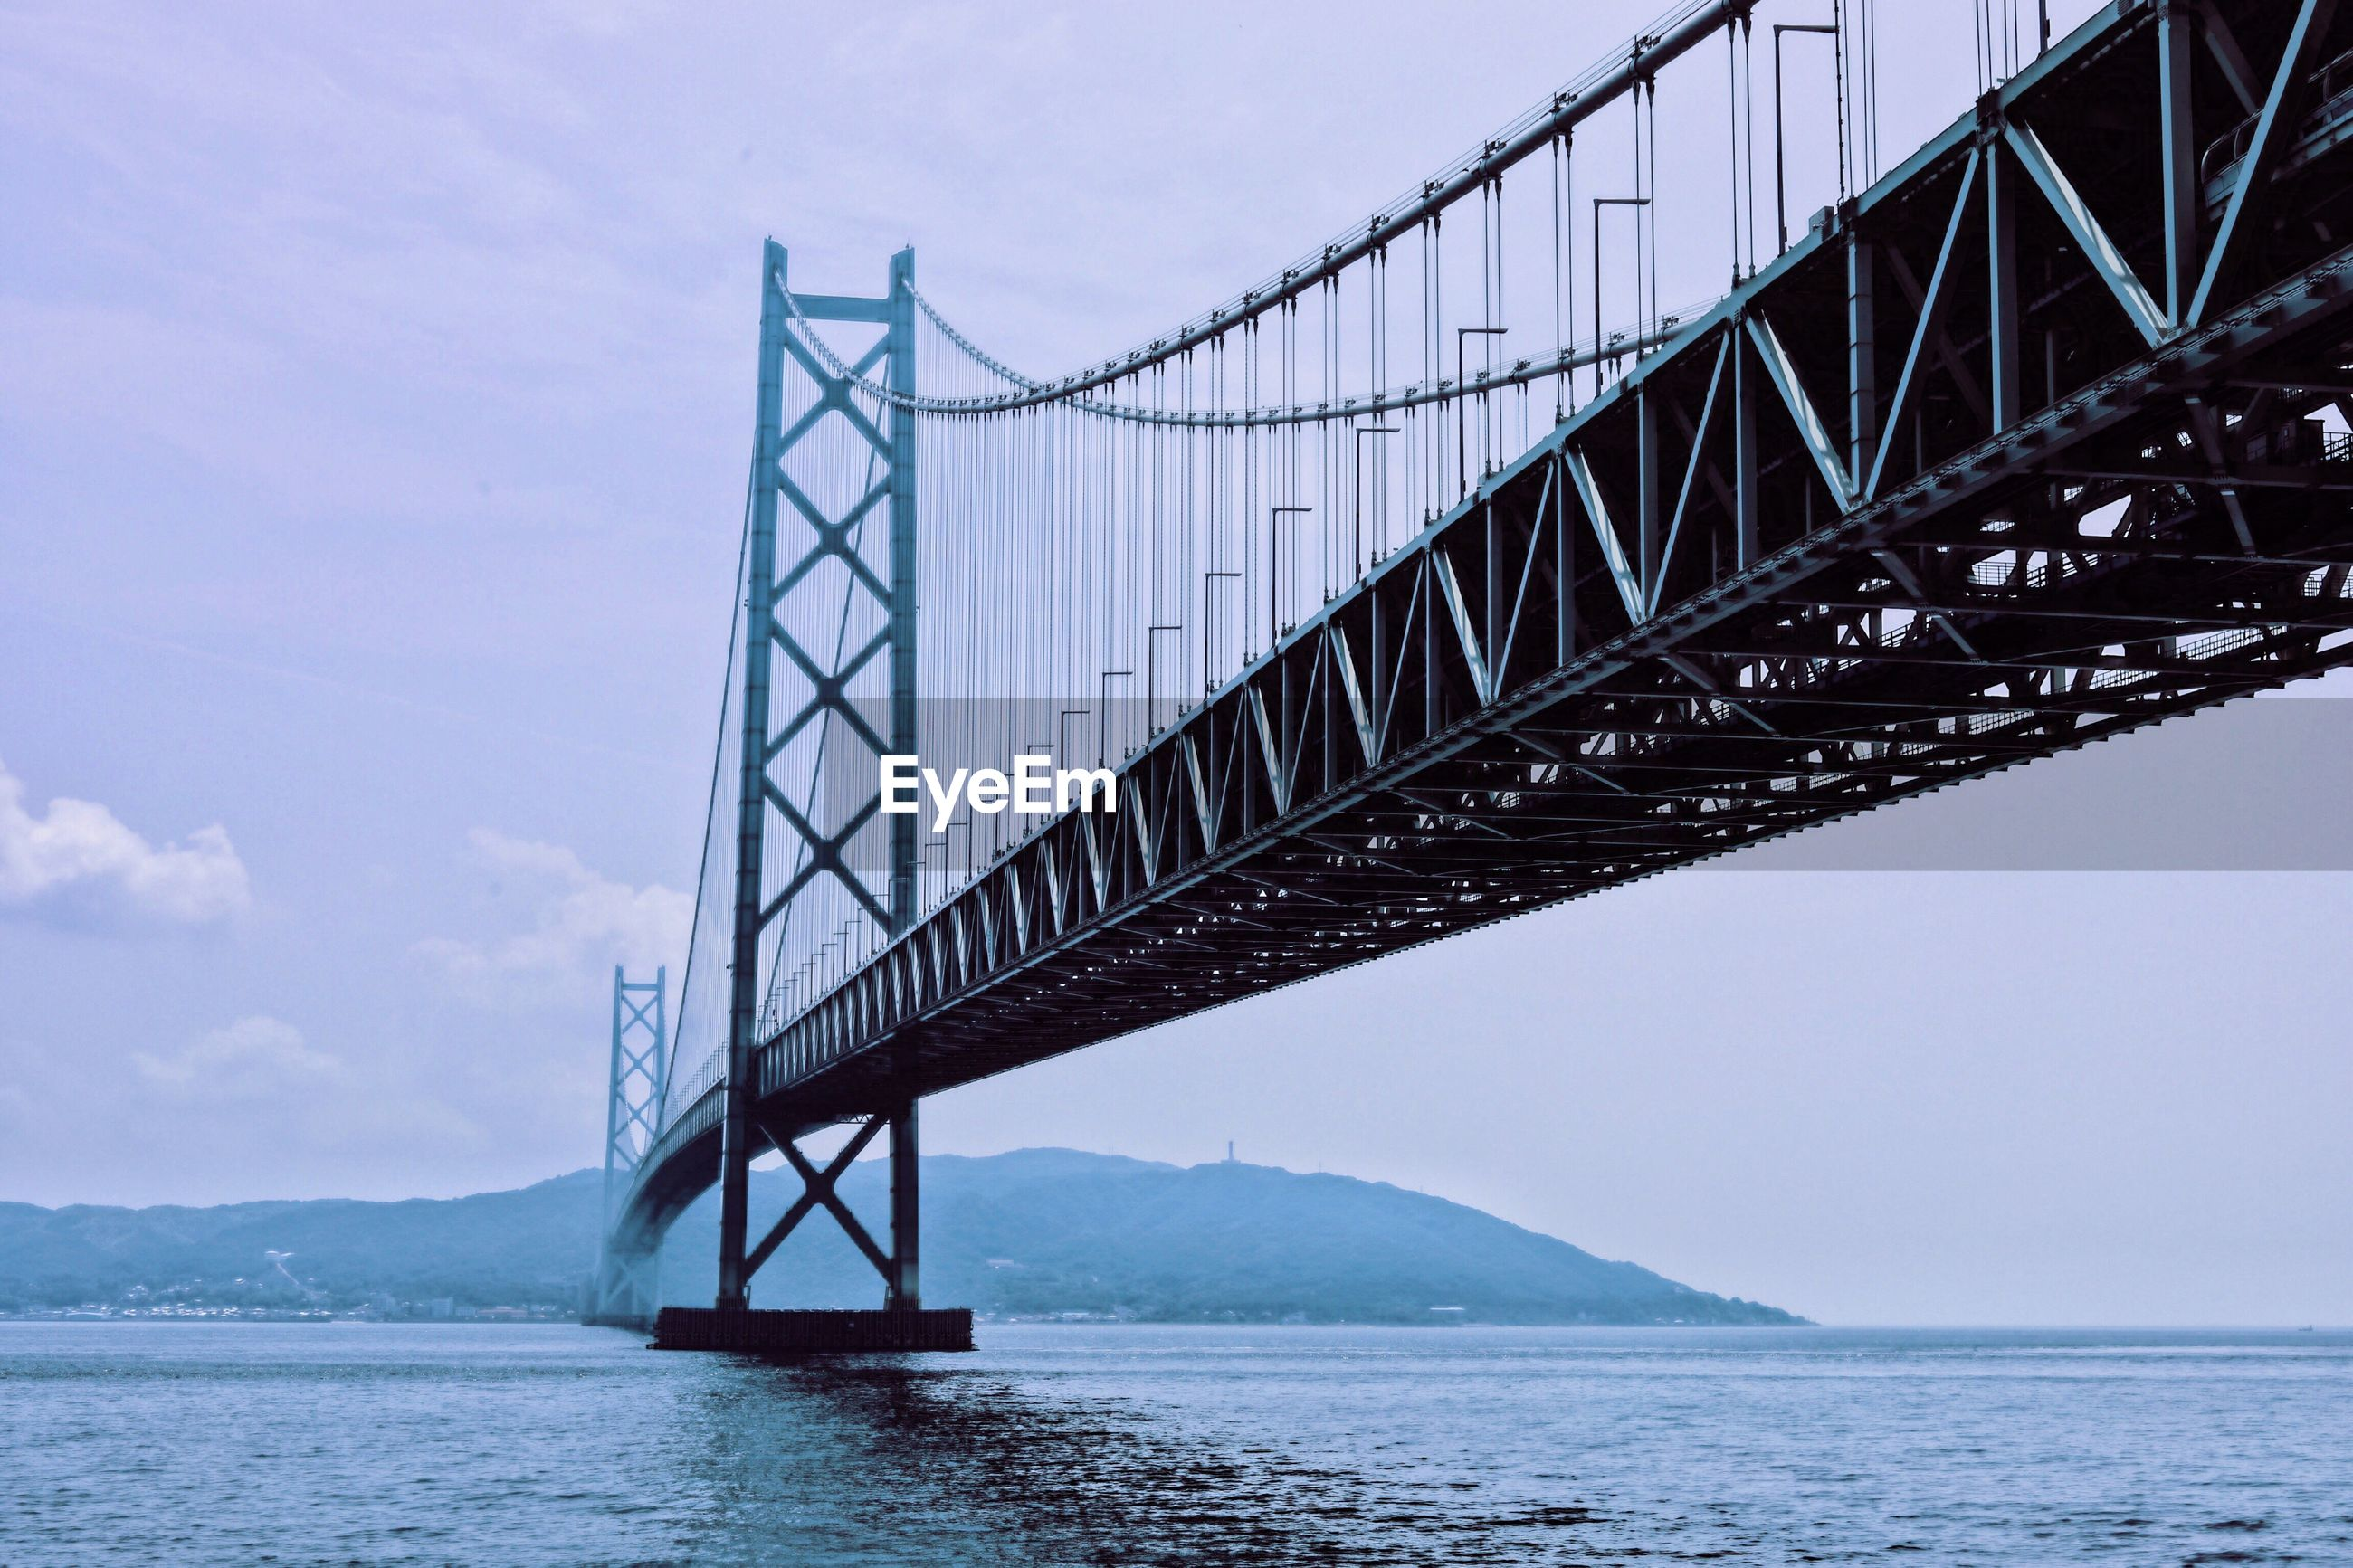 LOW ANGLE VIEW OF SUSPENSION BRIDGE IN SEA